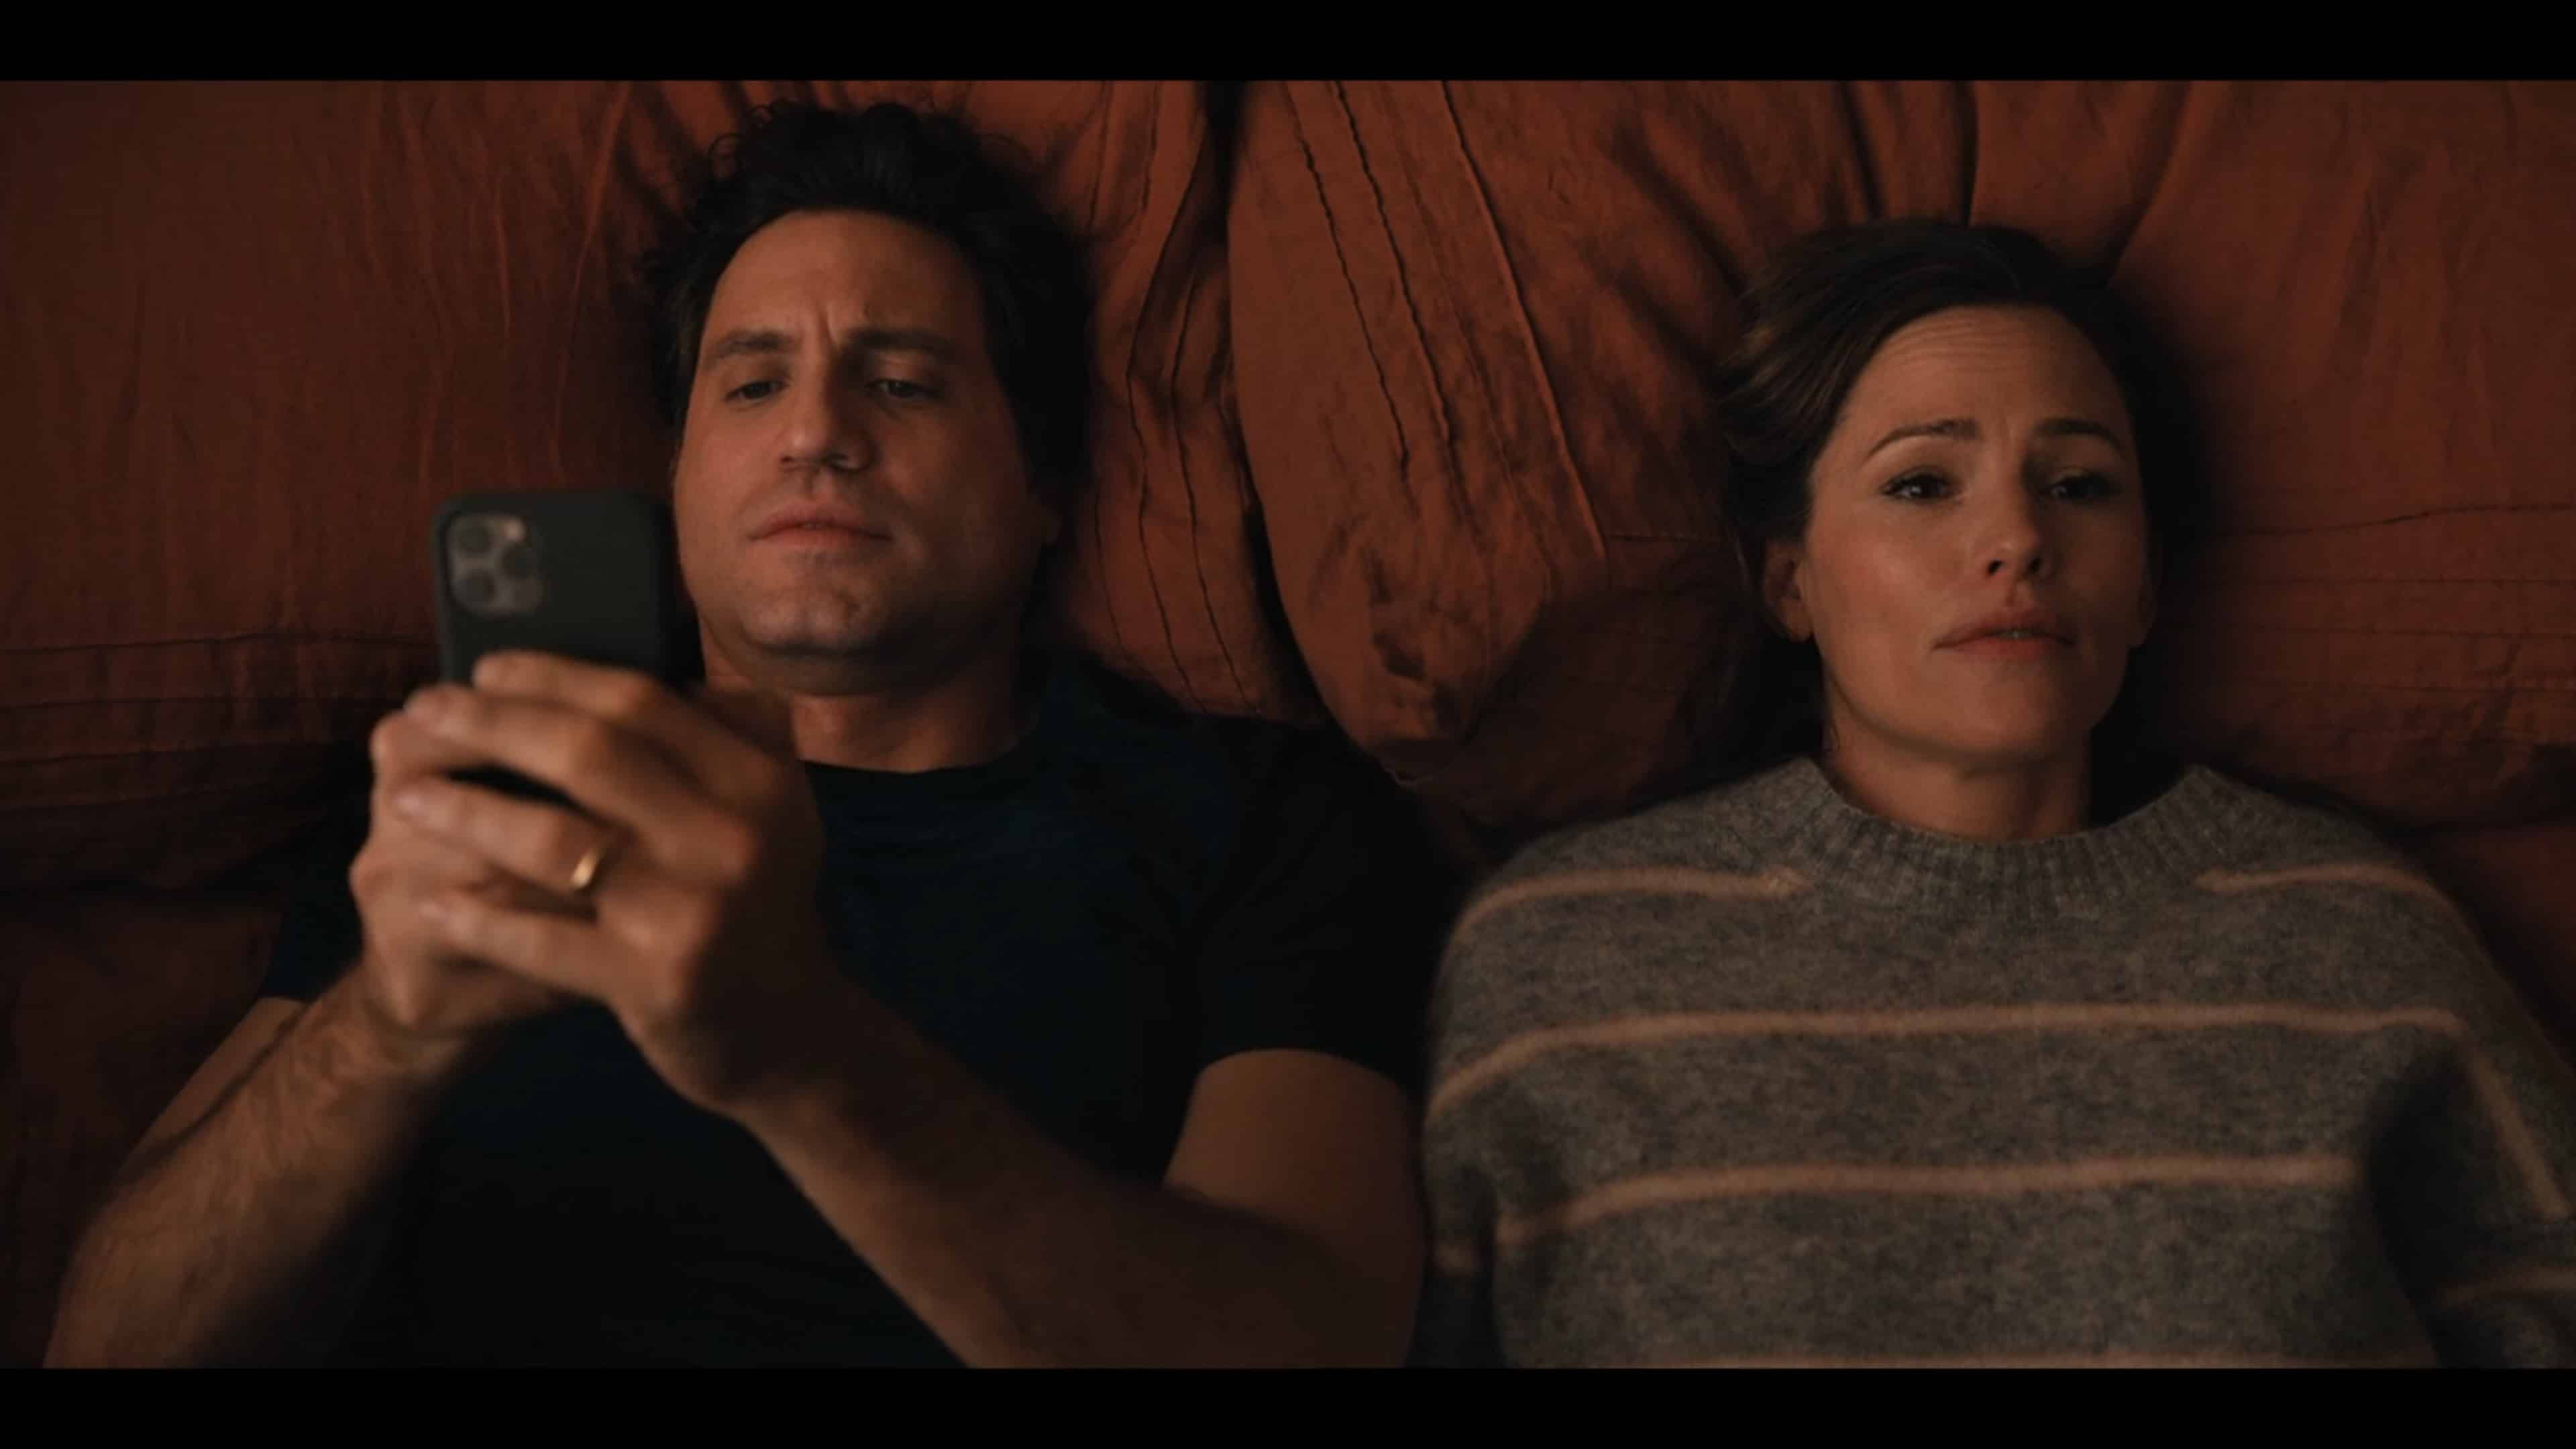 Carlos (Edgar Ramirez) and Allison (Jennifer Garner) in bed after a long day